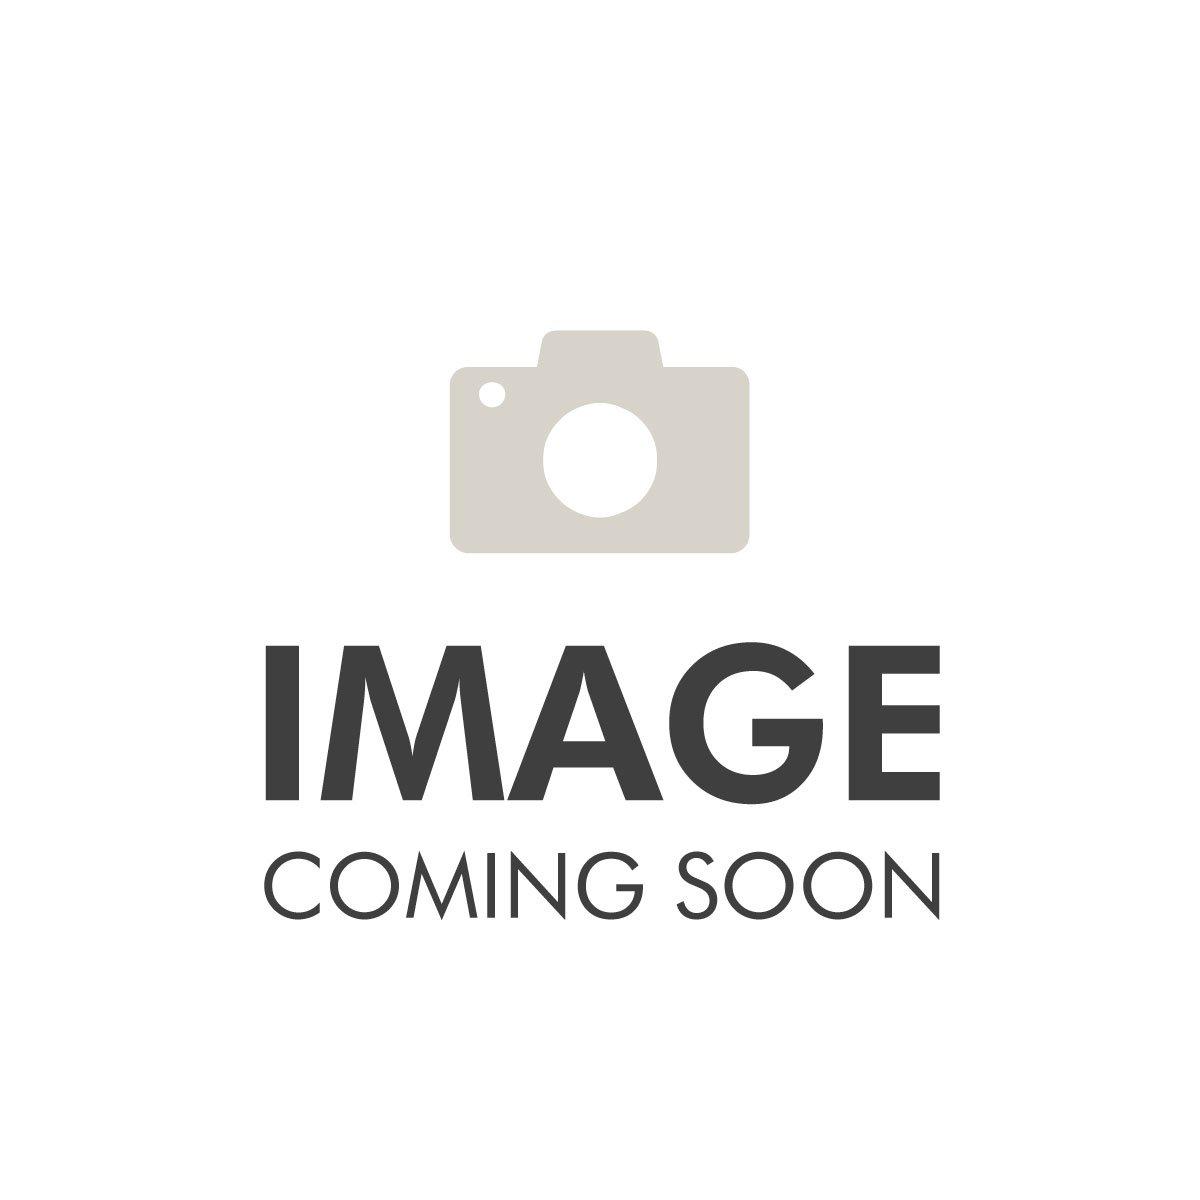 Revlon Powder Blush 5g - Naughty Nude